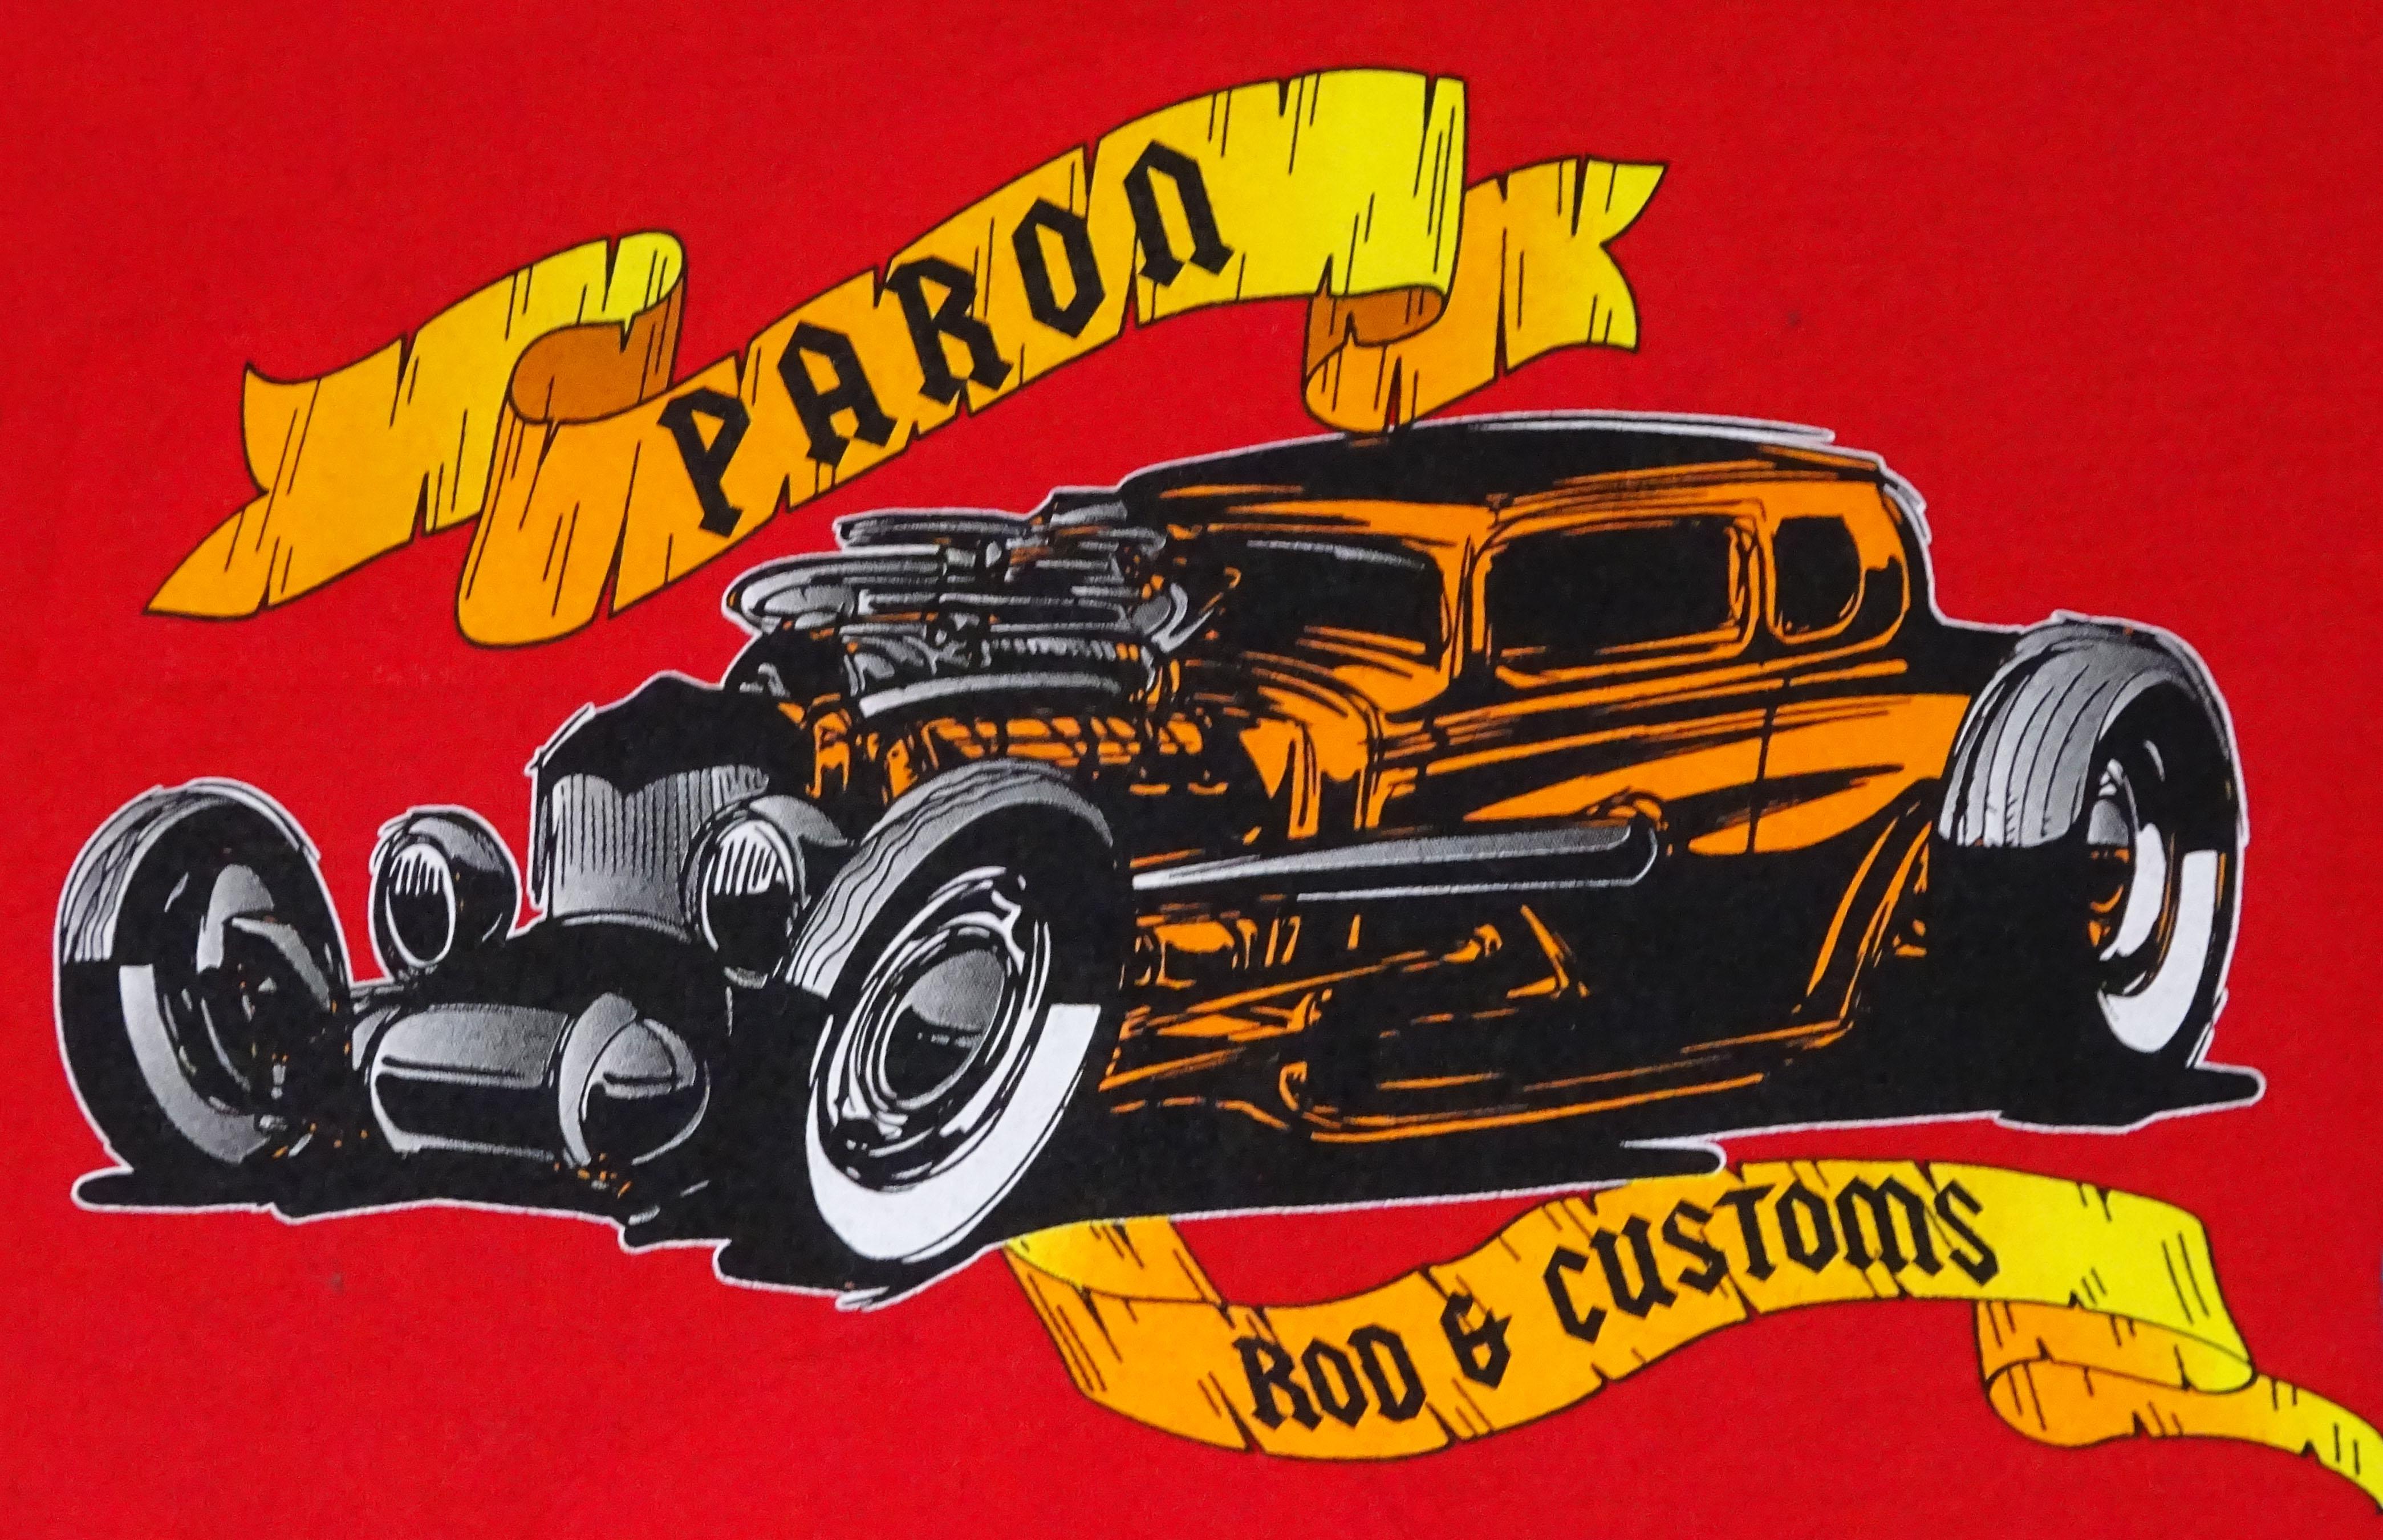 https://0901.nccdn.net/4_2/000/000/01e/20c/Calgary-Custom-print-tshirt-hot-rod.JPG